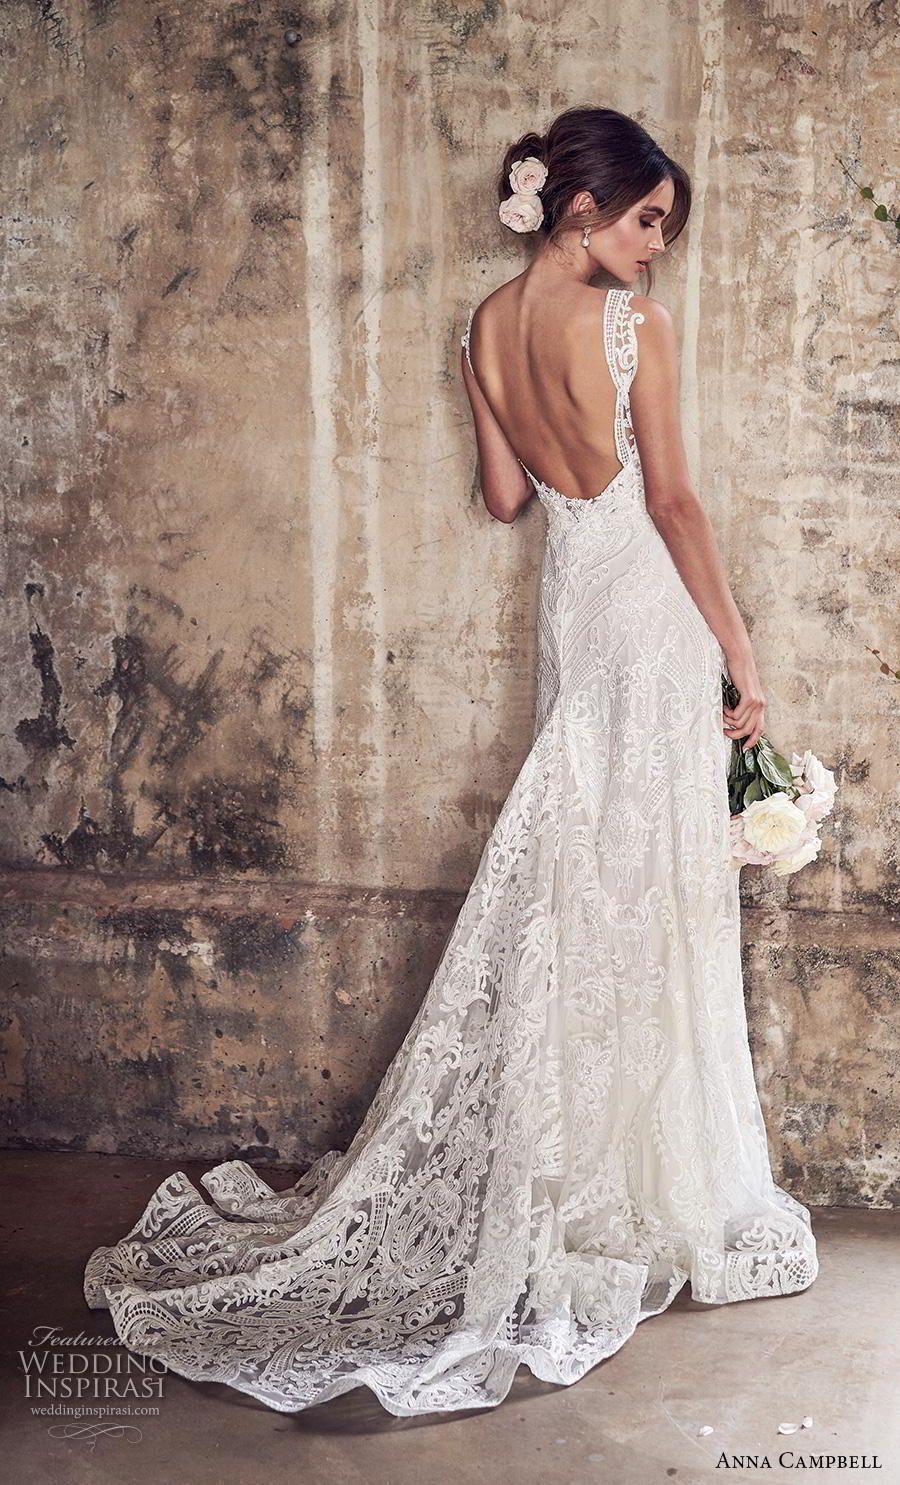 Undergarments for a line wedding dress  Anna Campbell  Wedding Dresses u ucWanderlustud Bridal Collection